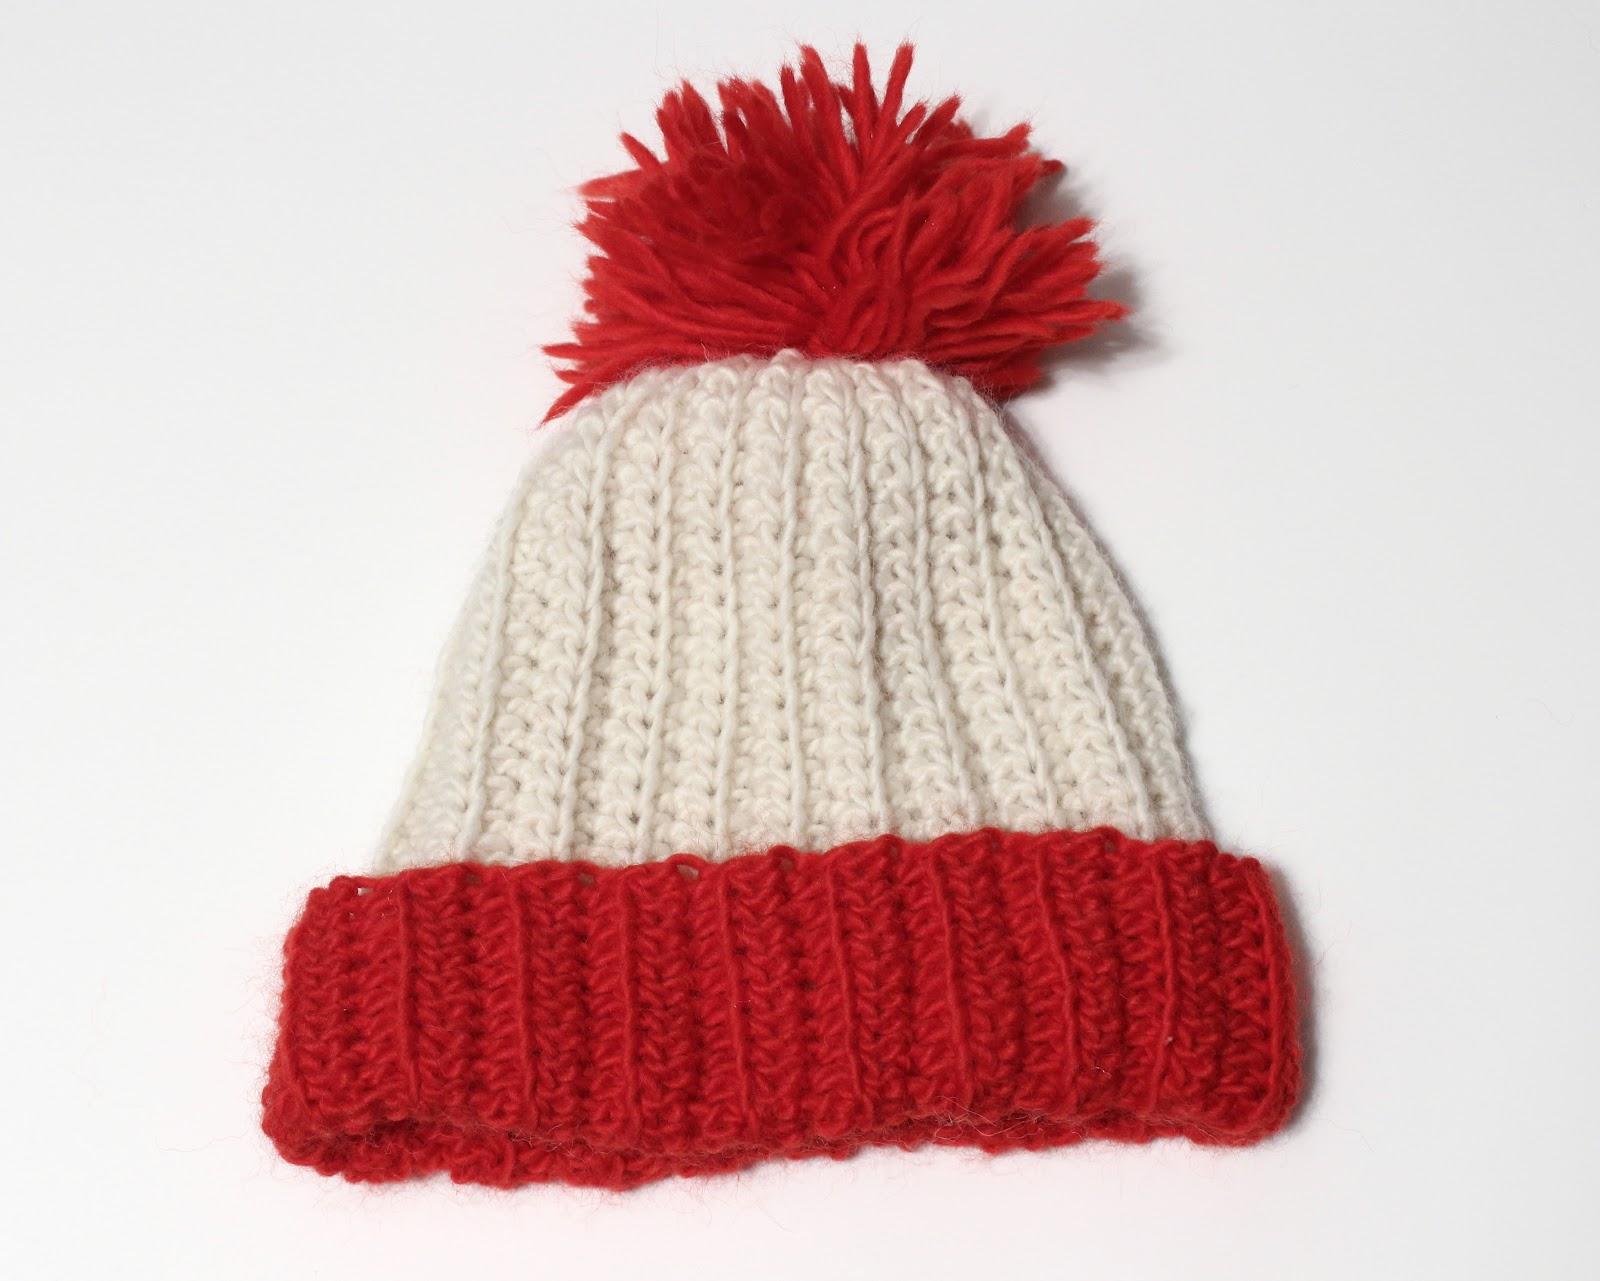 Crochet Hat : Crocheted Where?s Waldo Hat + Tutorial Heavily Edited